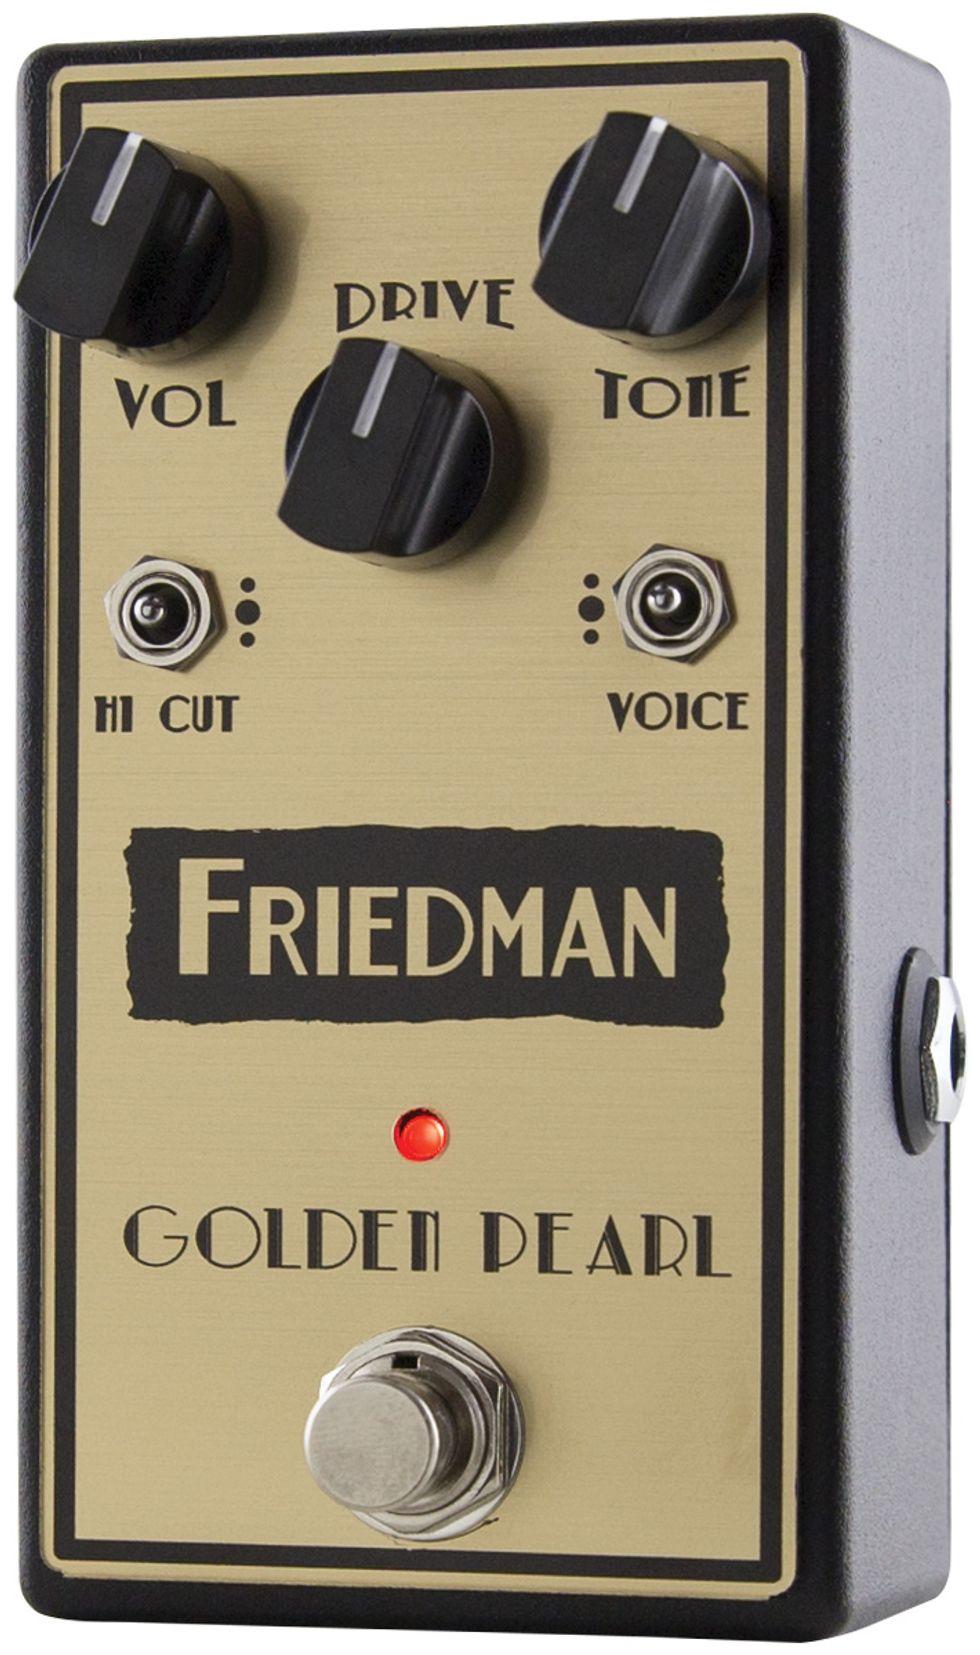 Apr19-Friedman-FEAT